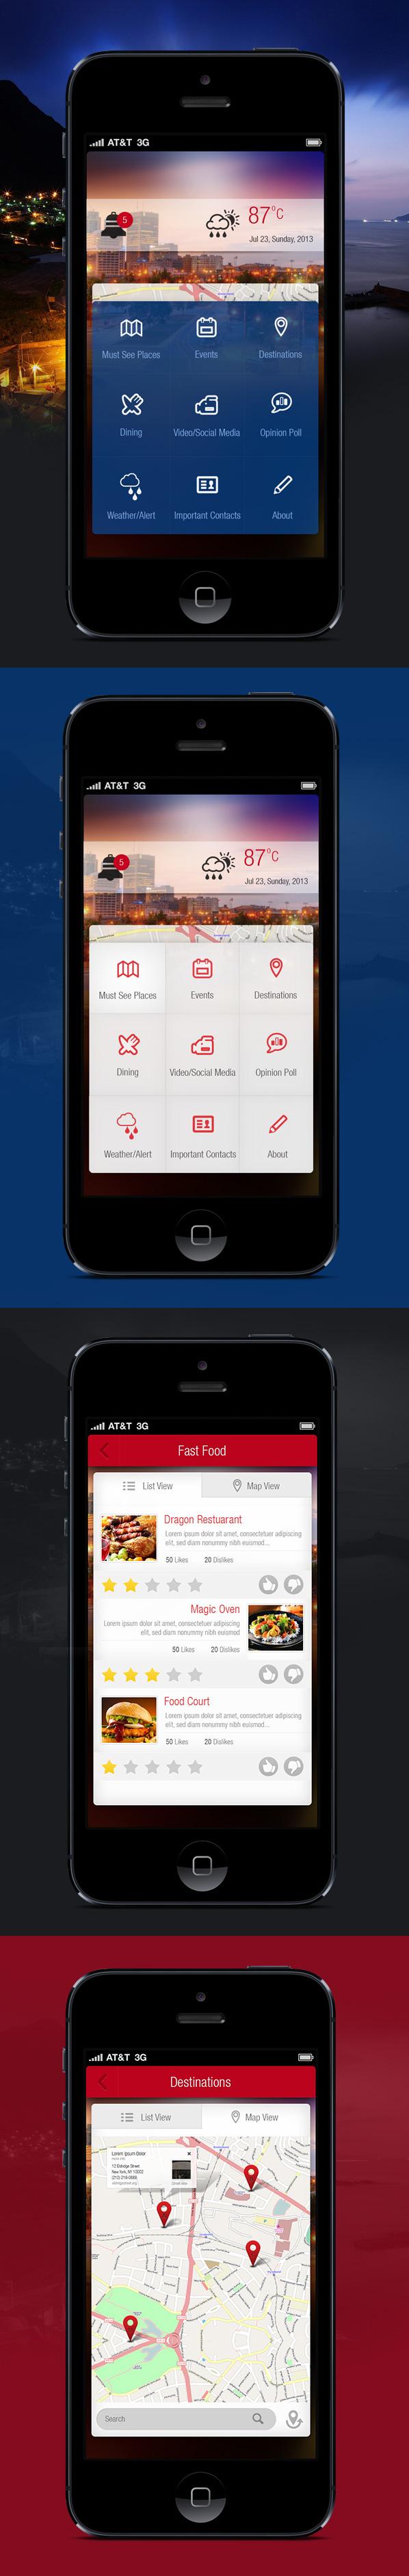 iphone app Mobile app restuarant hotel Freelance Project freelancer India designer weather weather app Tour Guid tourism